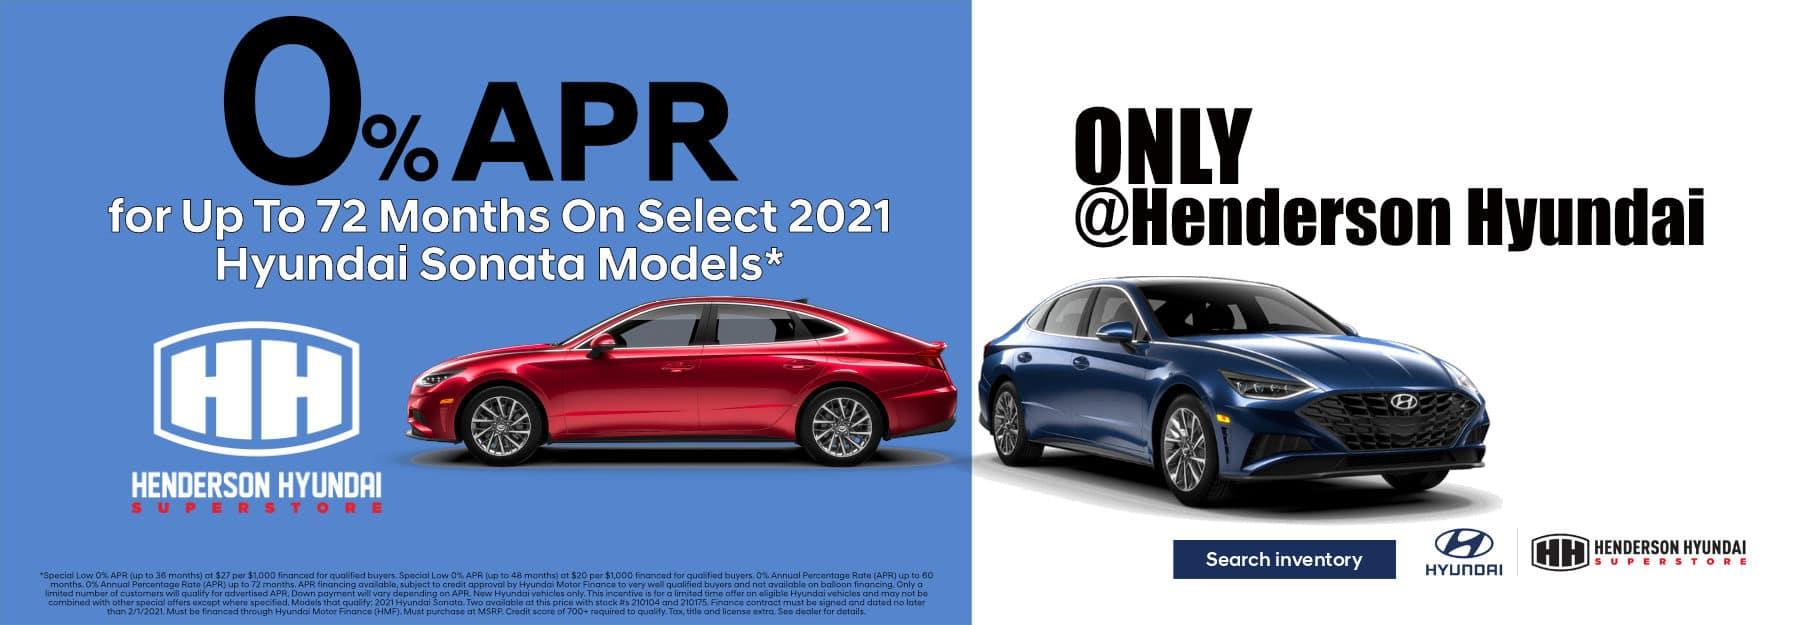 R_January 2021_Sonata_General_Webslider_Henderson_Hyundai